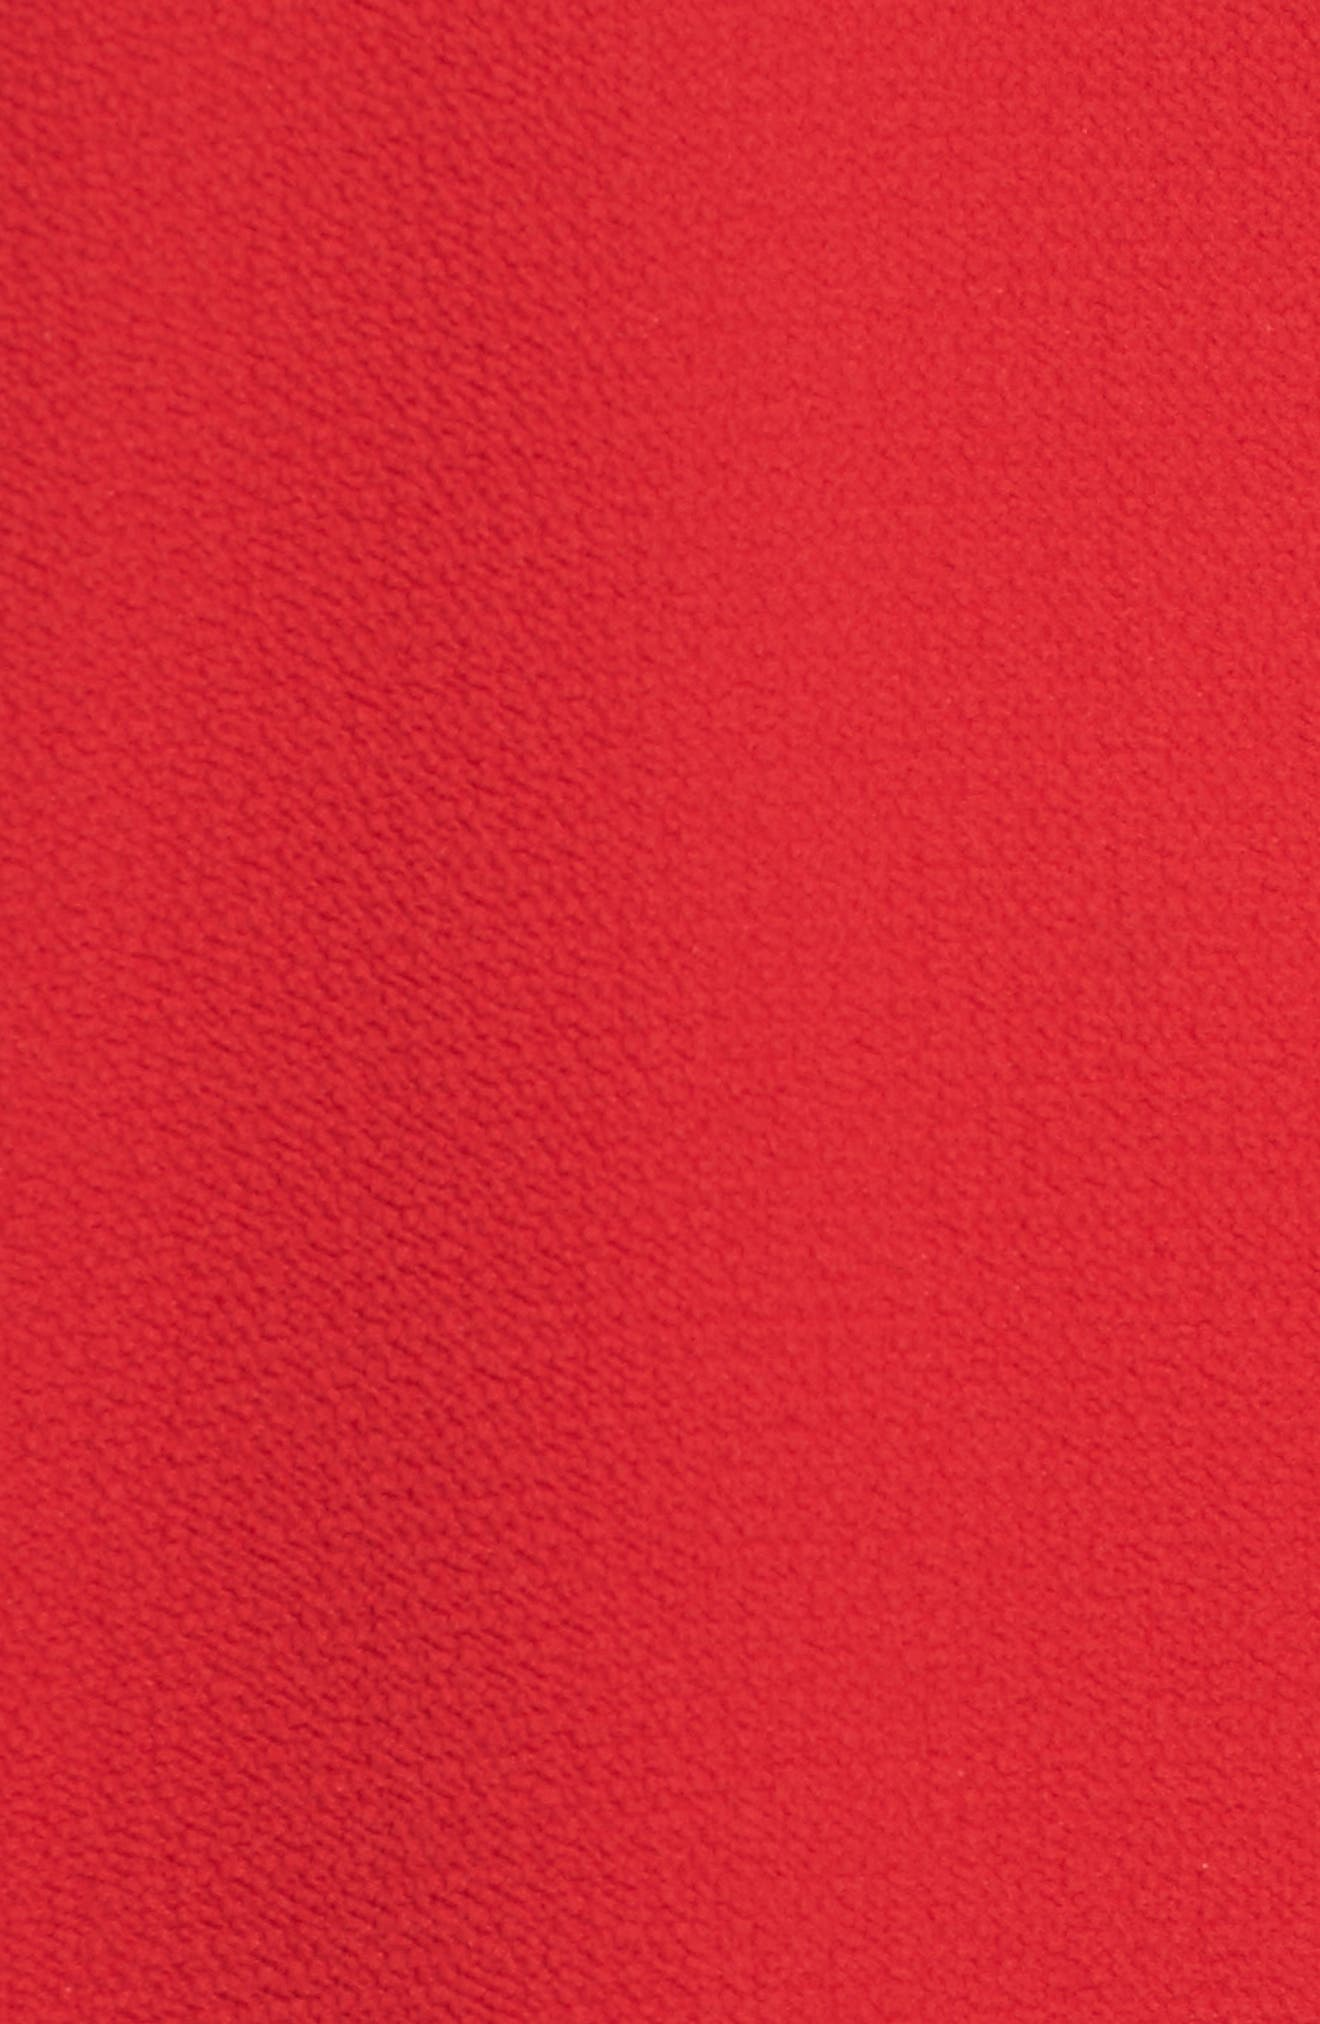 Cold Shoulder Ruffle Top,                             Alternate thumbnail 5, color,                             Crimson